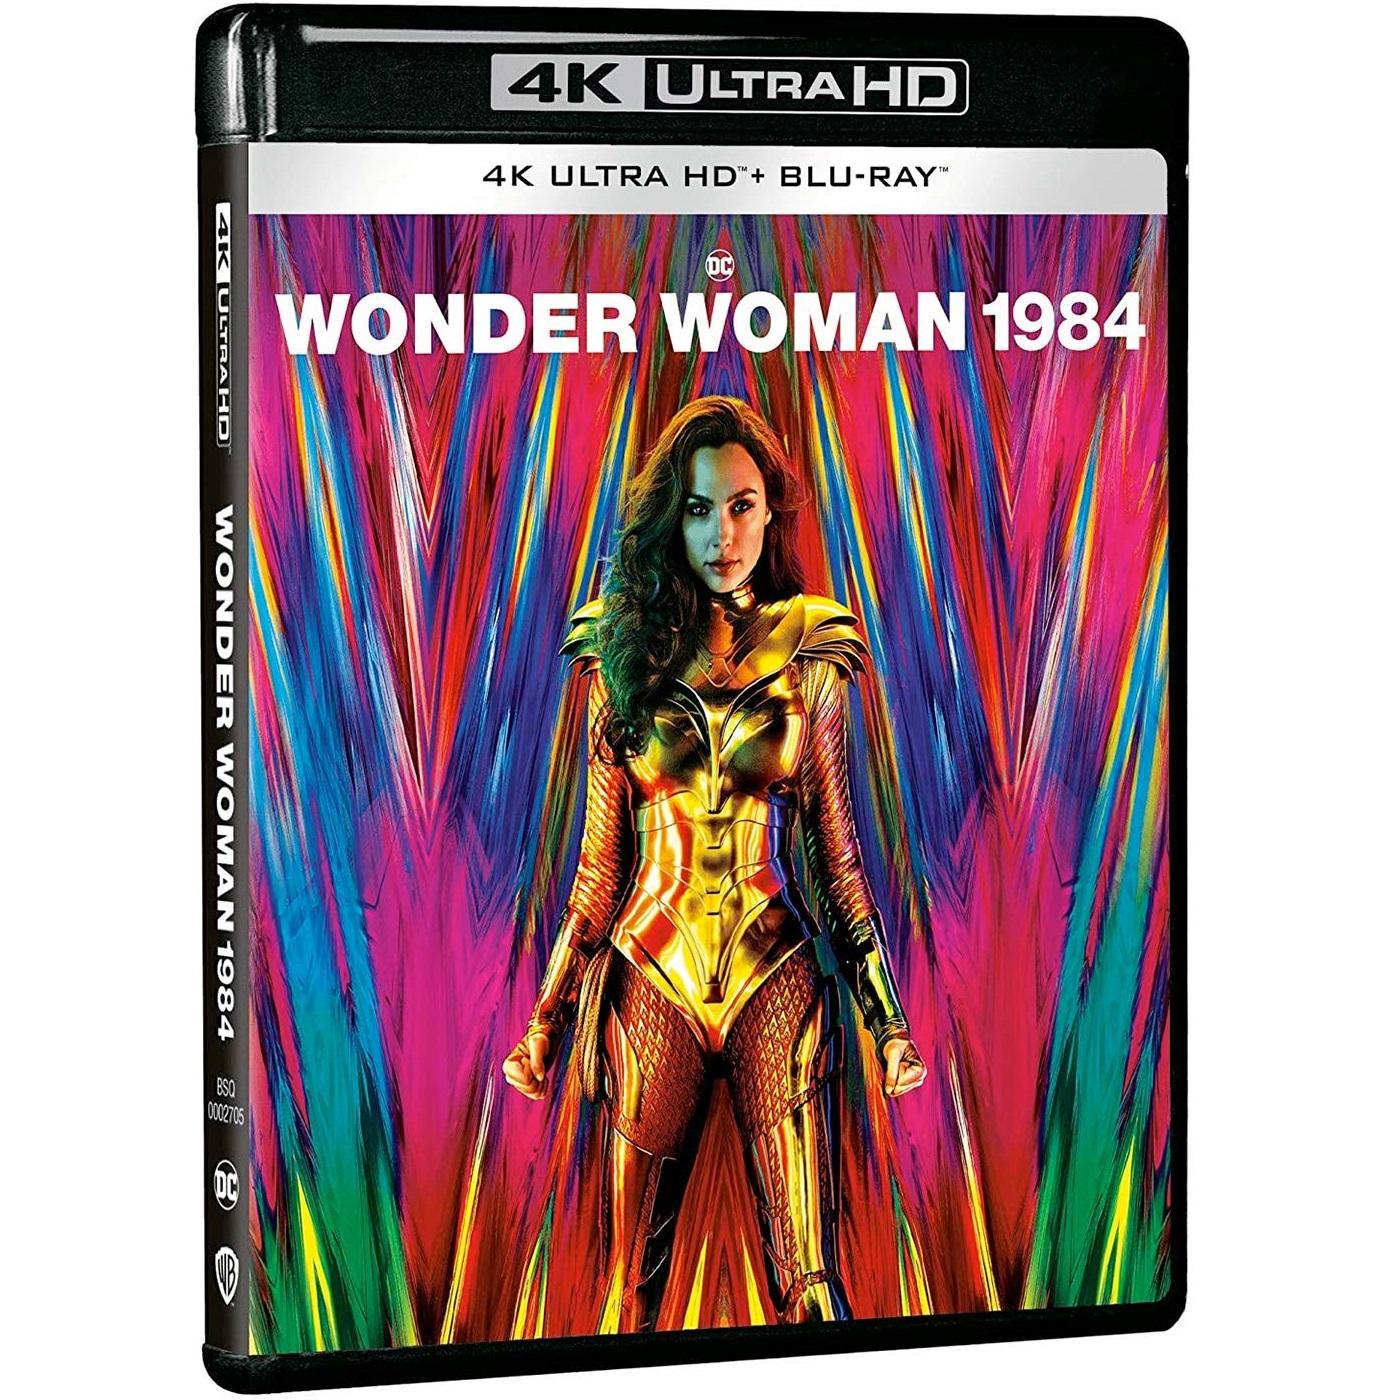 WONDER WOMAN 1984 4K+2D (4K UHD BLU-RAY + BLU-RAY 2D)